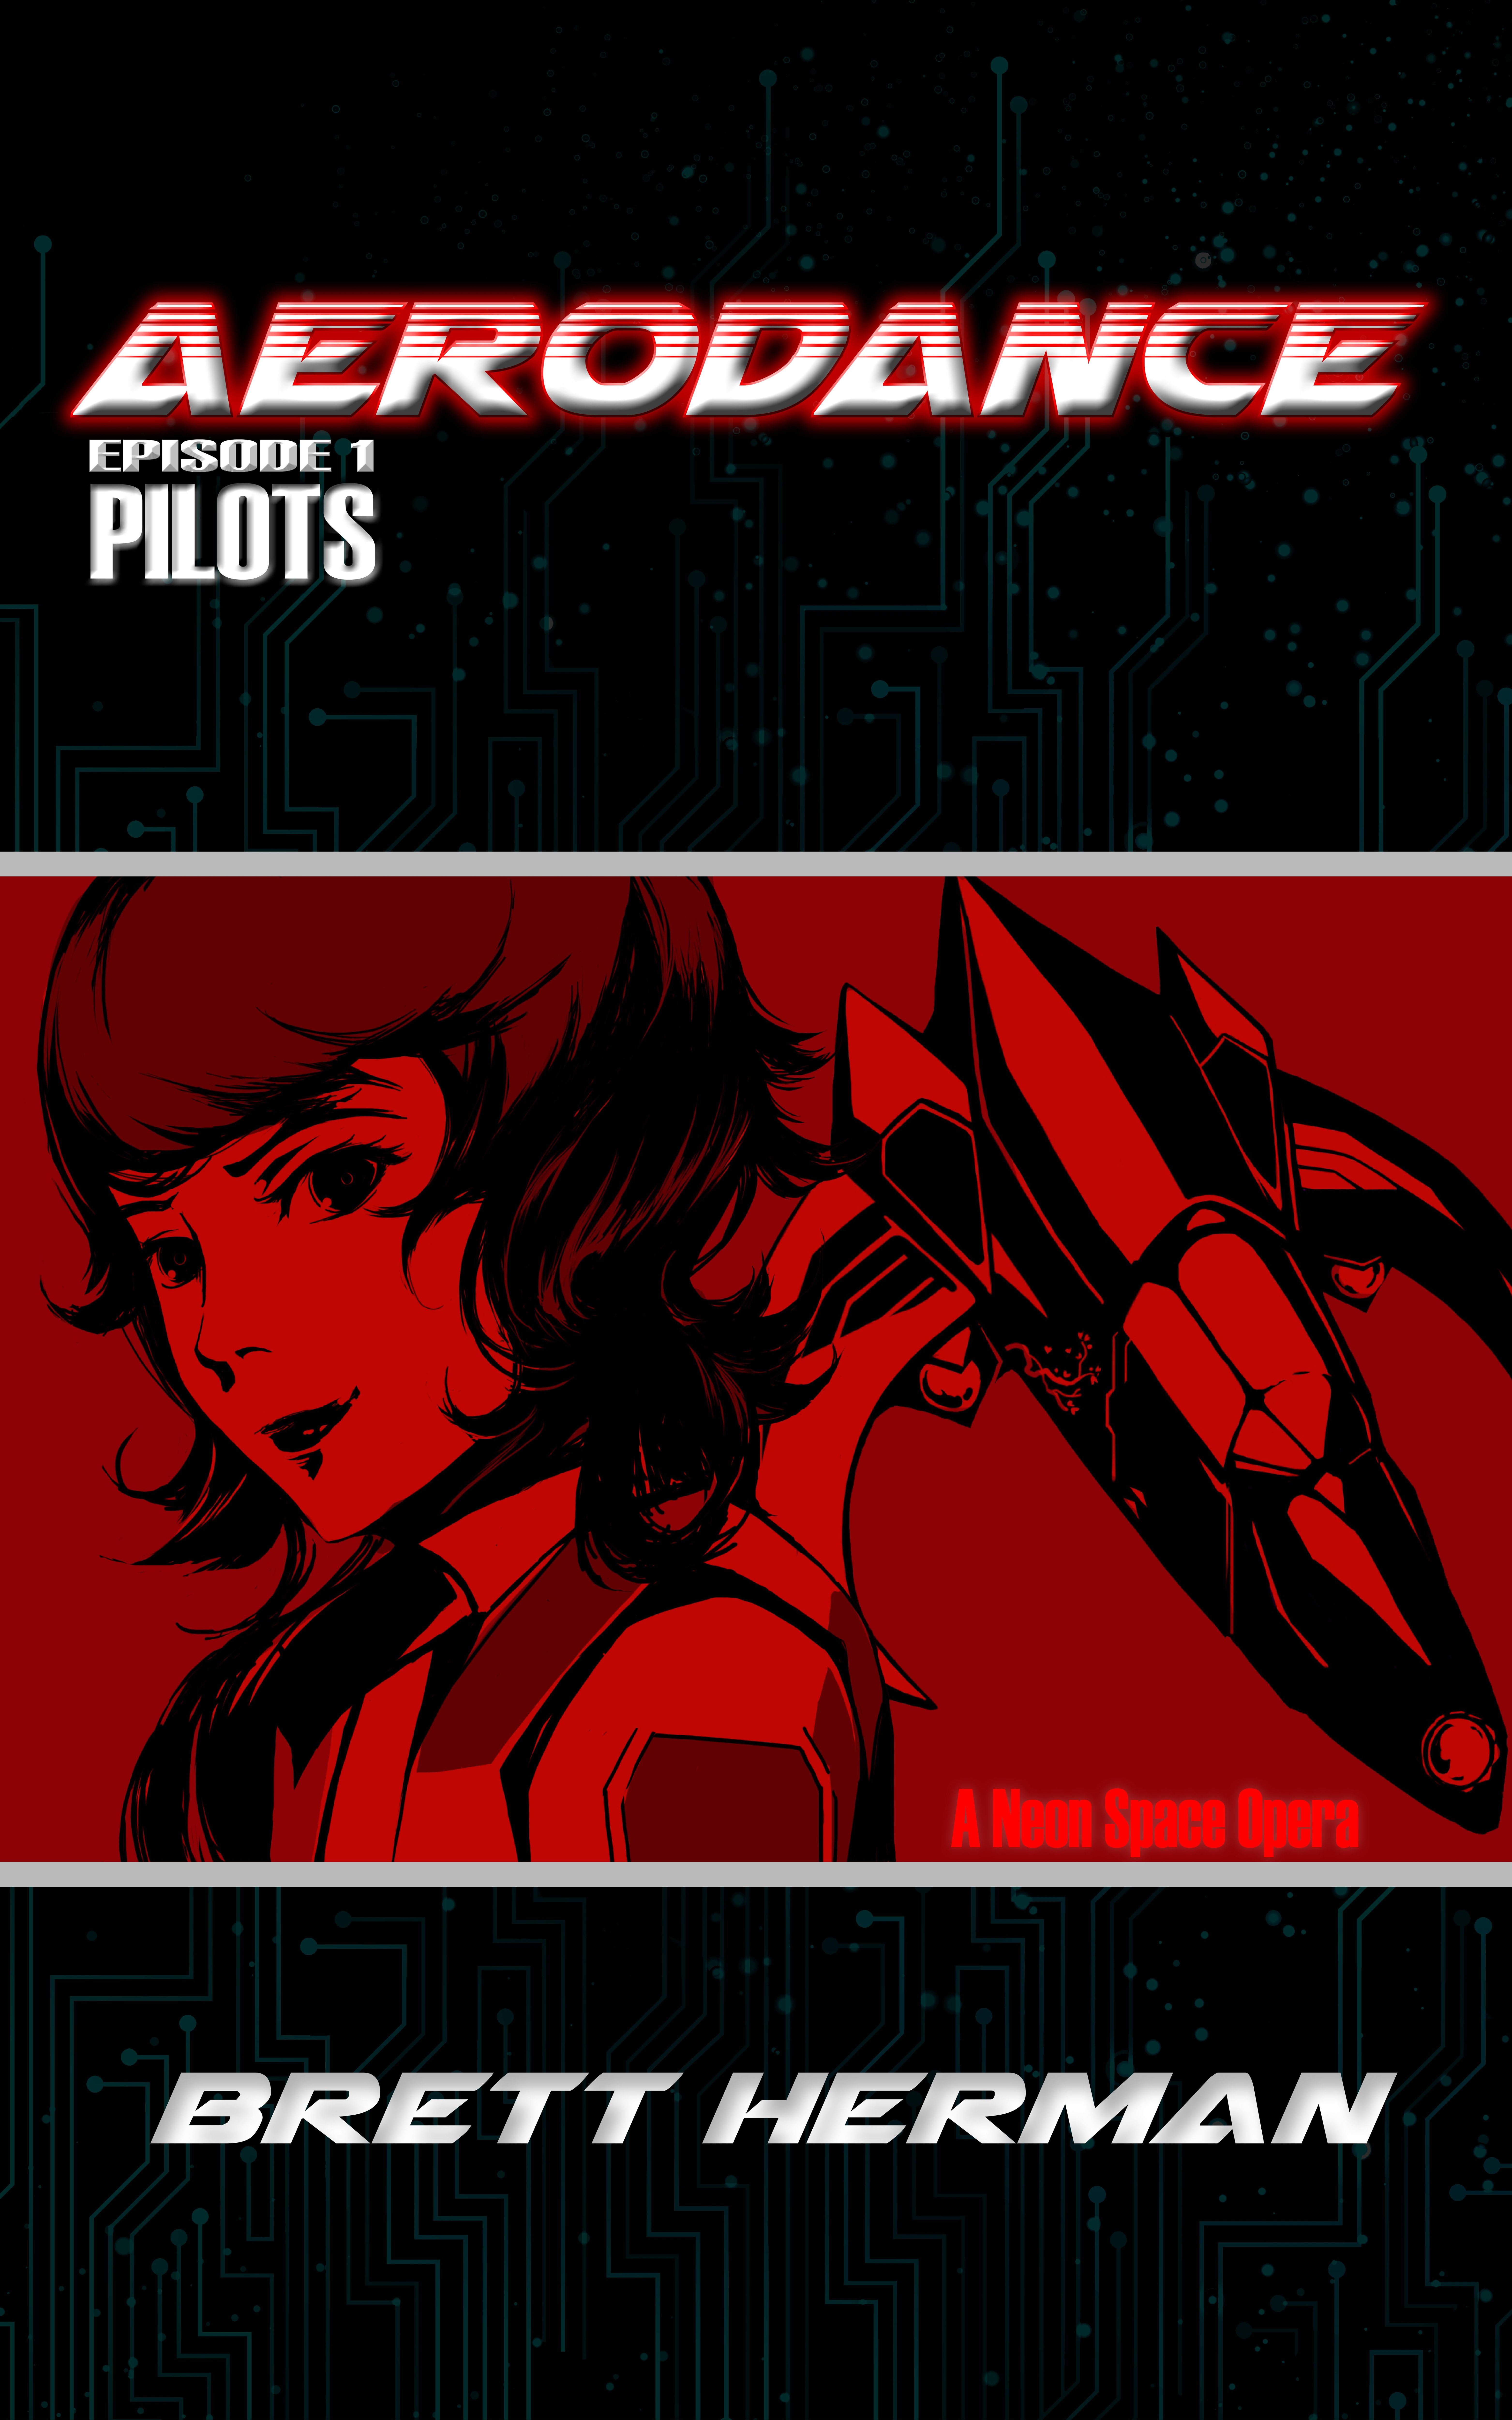 Aerodance Pilots Kindle Cover 2018.jpg